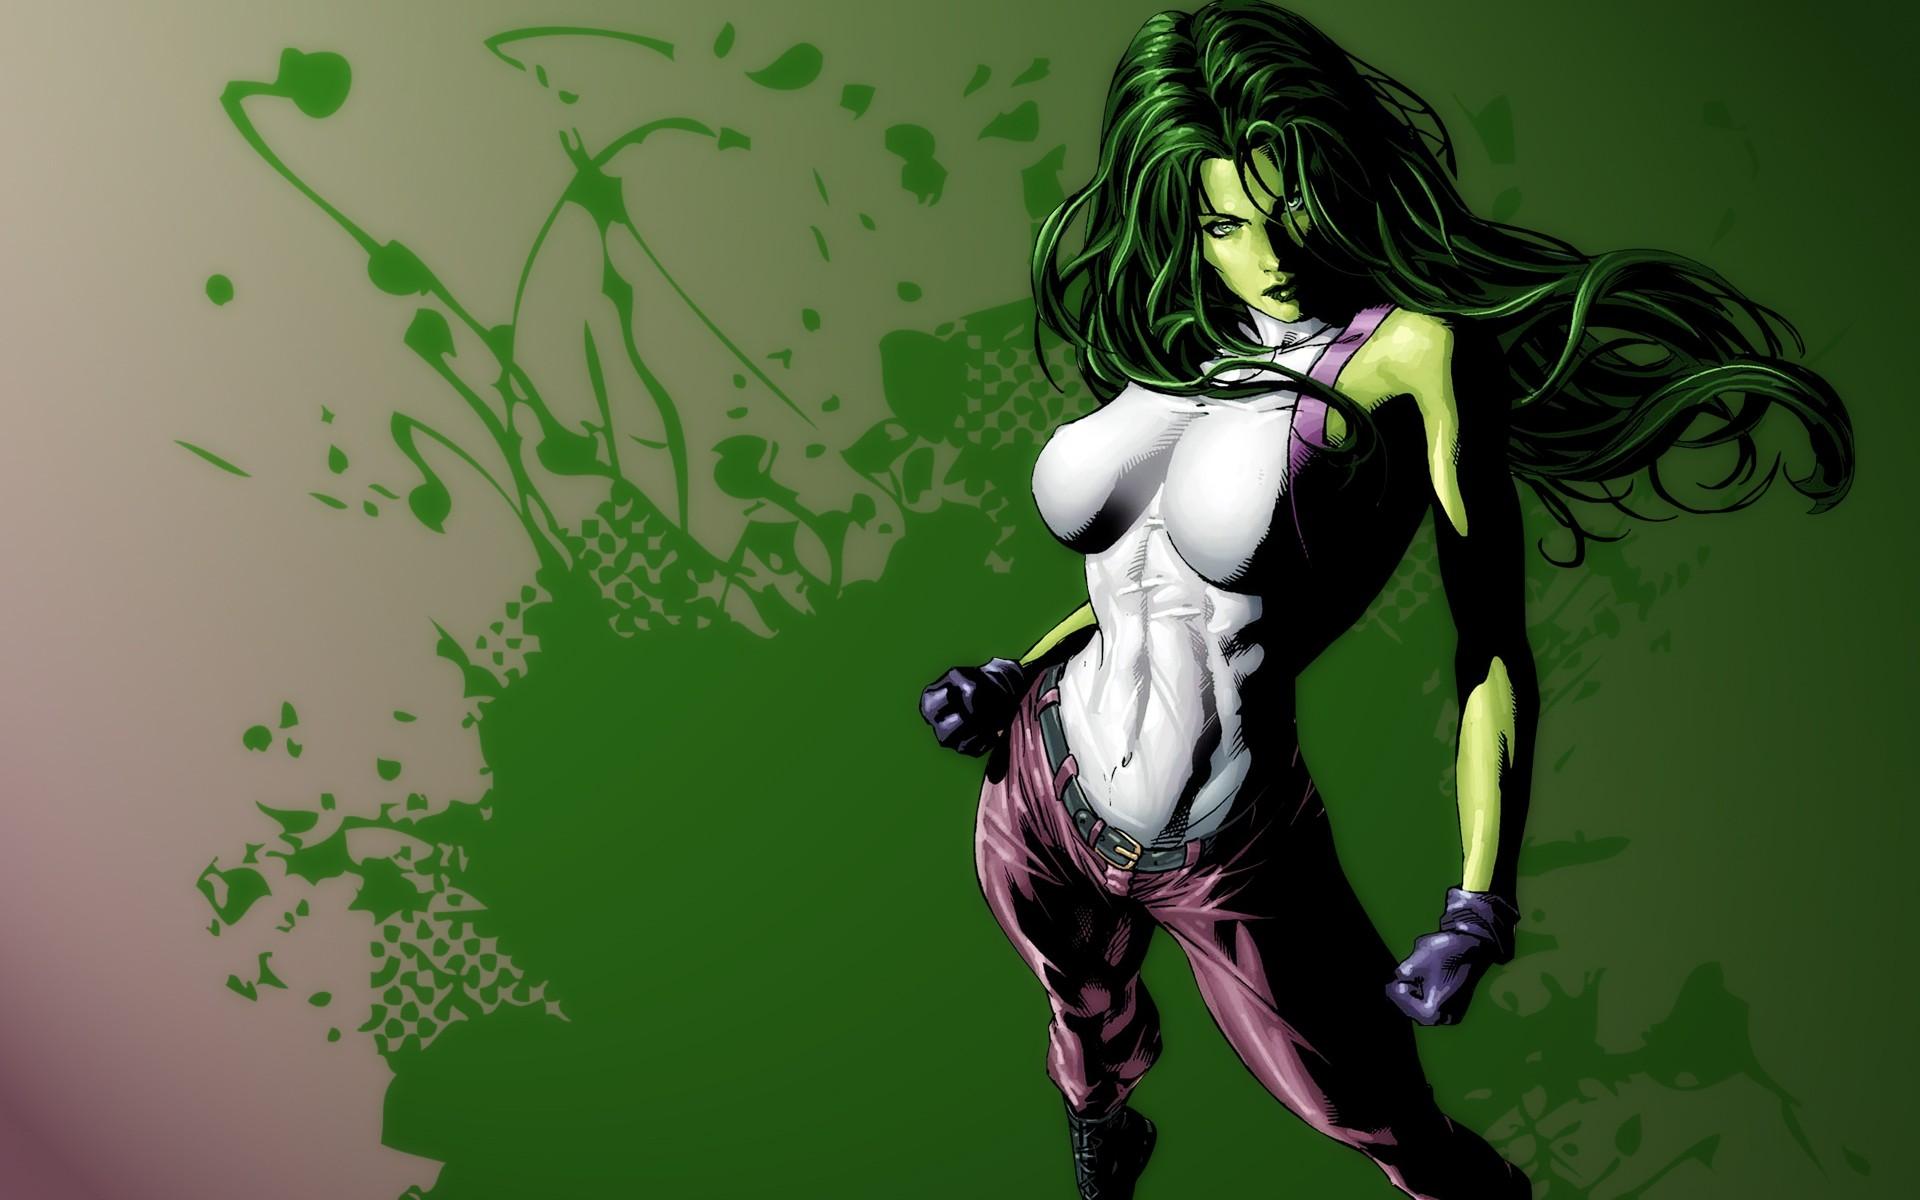 Tatiana Maslany, She-Hulk oynayacağı iddialarını yalanladı